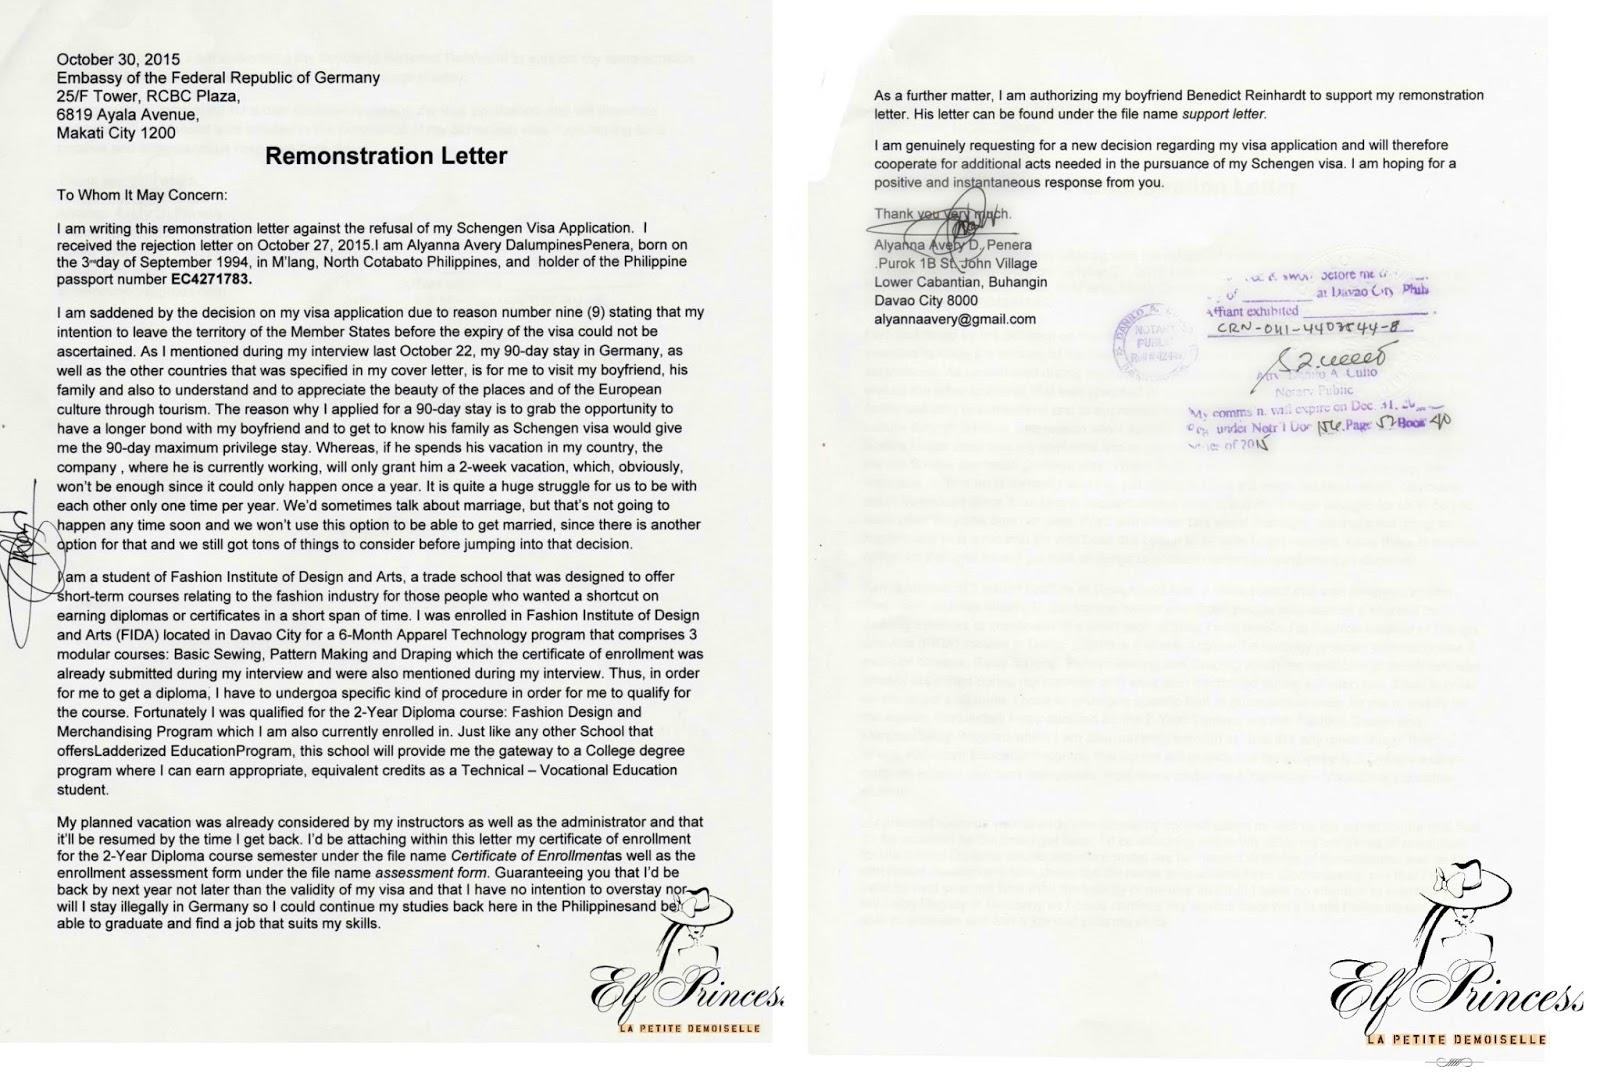 Us visa refusal denial and re application letter for school